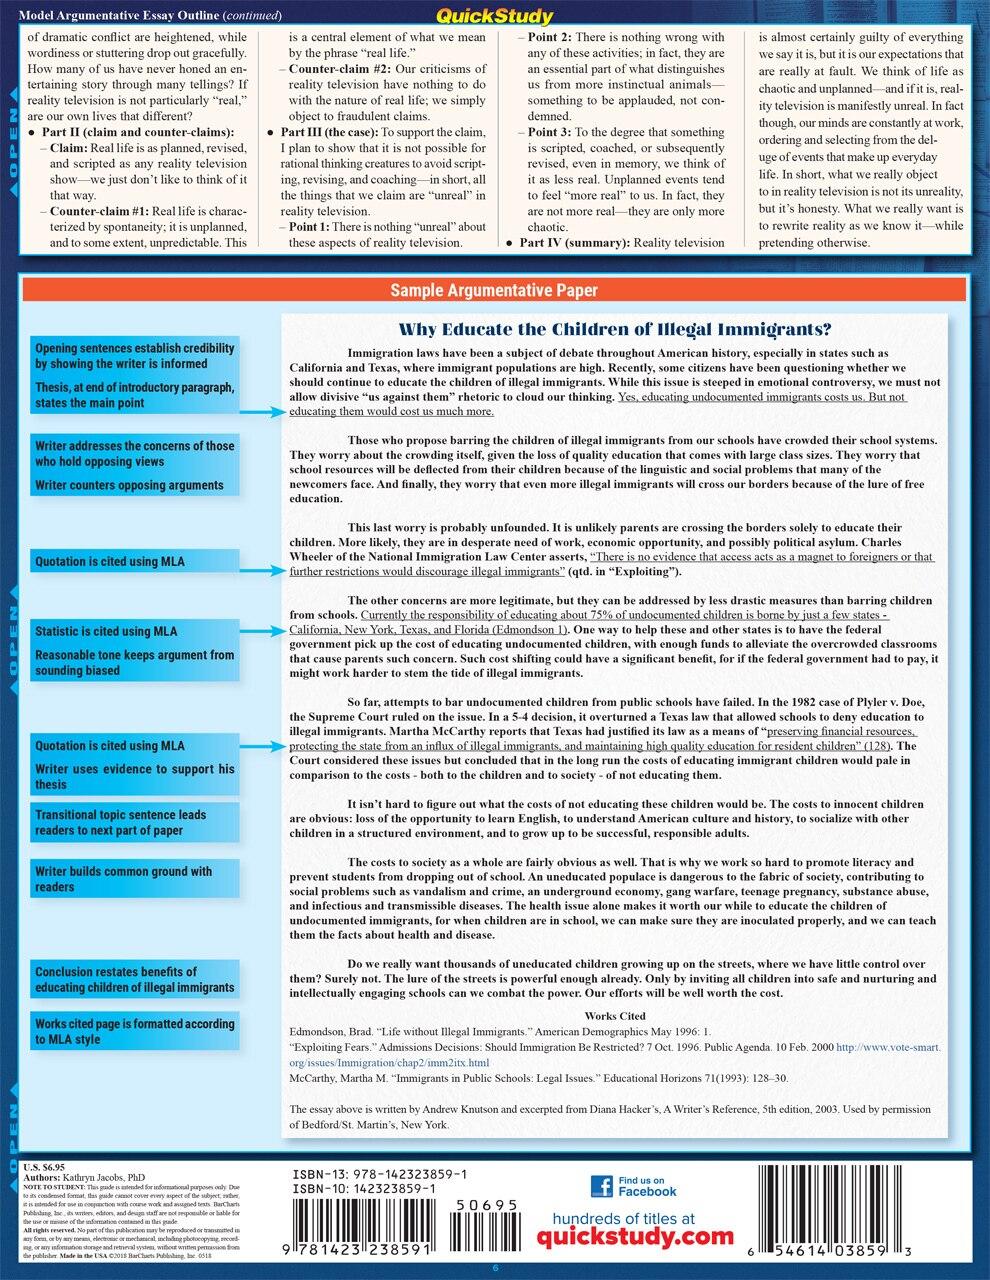 Quick Study QuickStudy Argumentative Essay Laminated Study Guide BarCharts Publishing Language Arts Reference Back Image